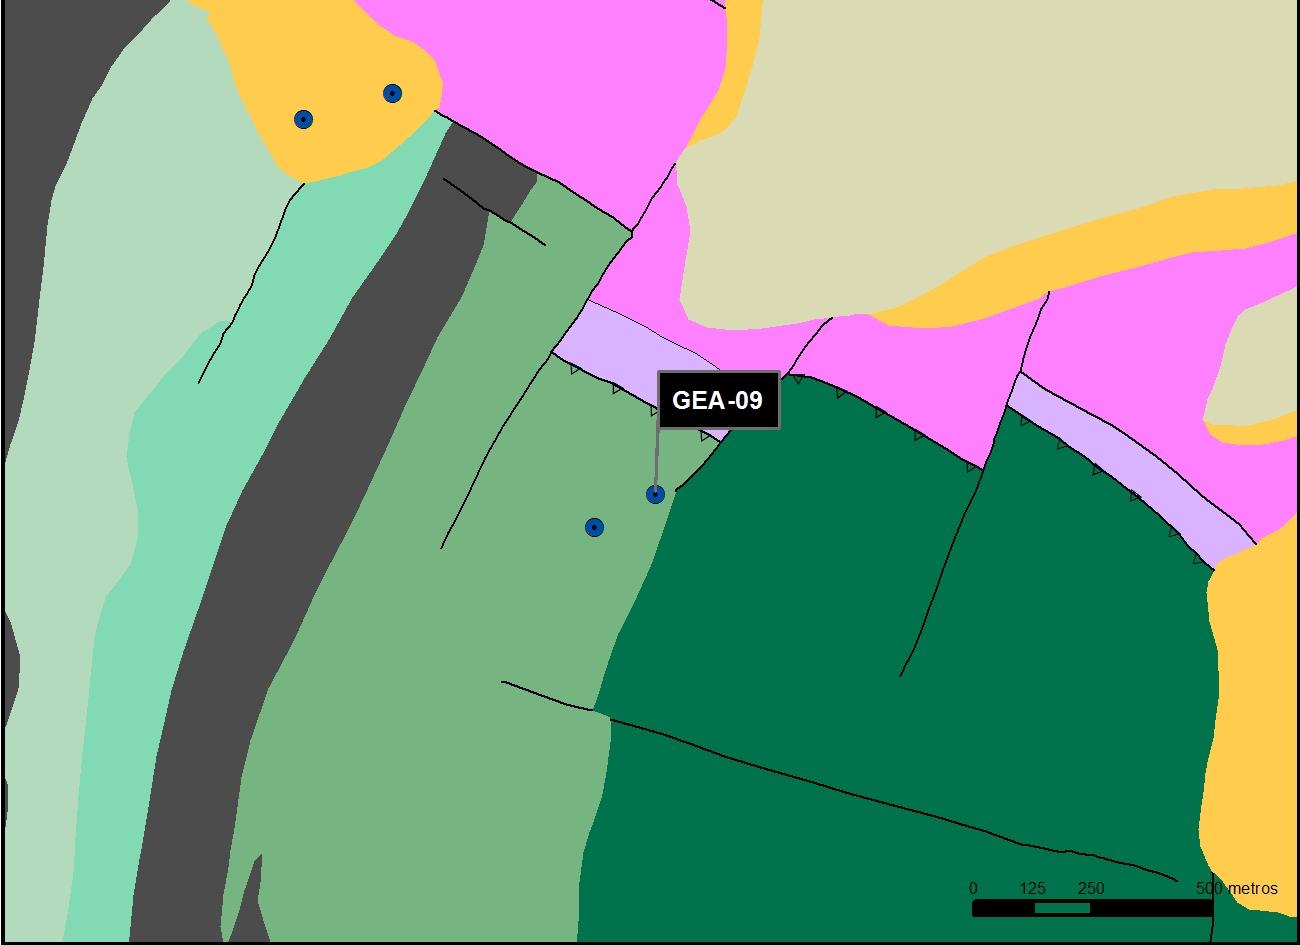 GEA_09_M.V.LOZANO_MEADERO_MAP.GEOL